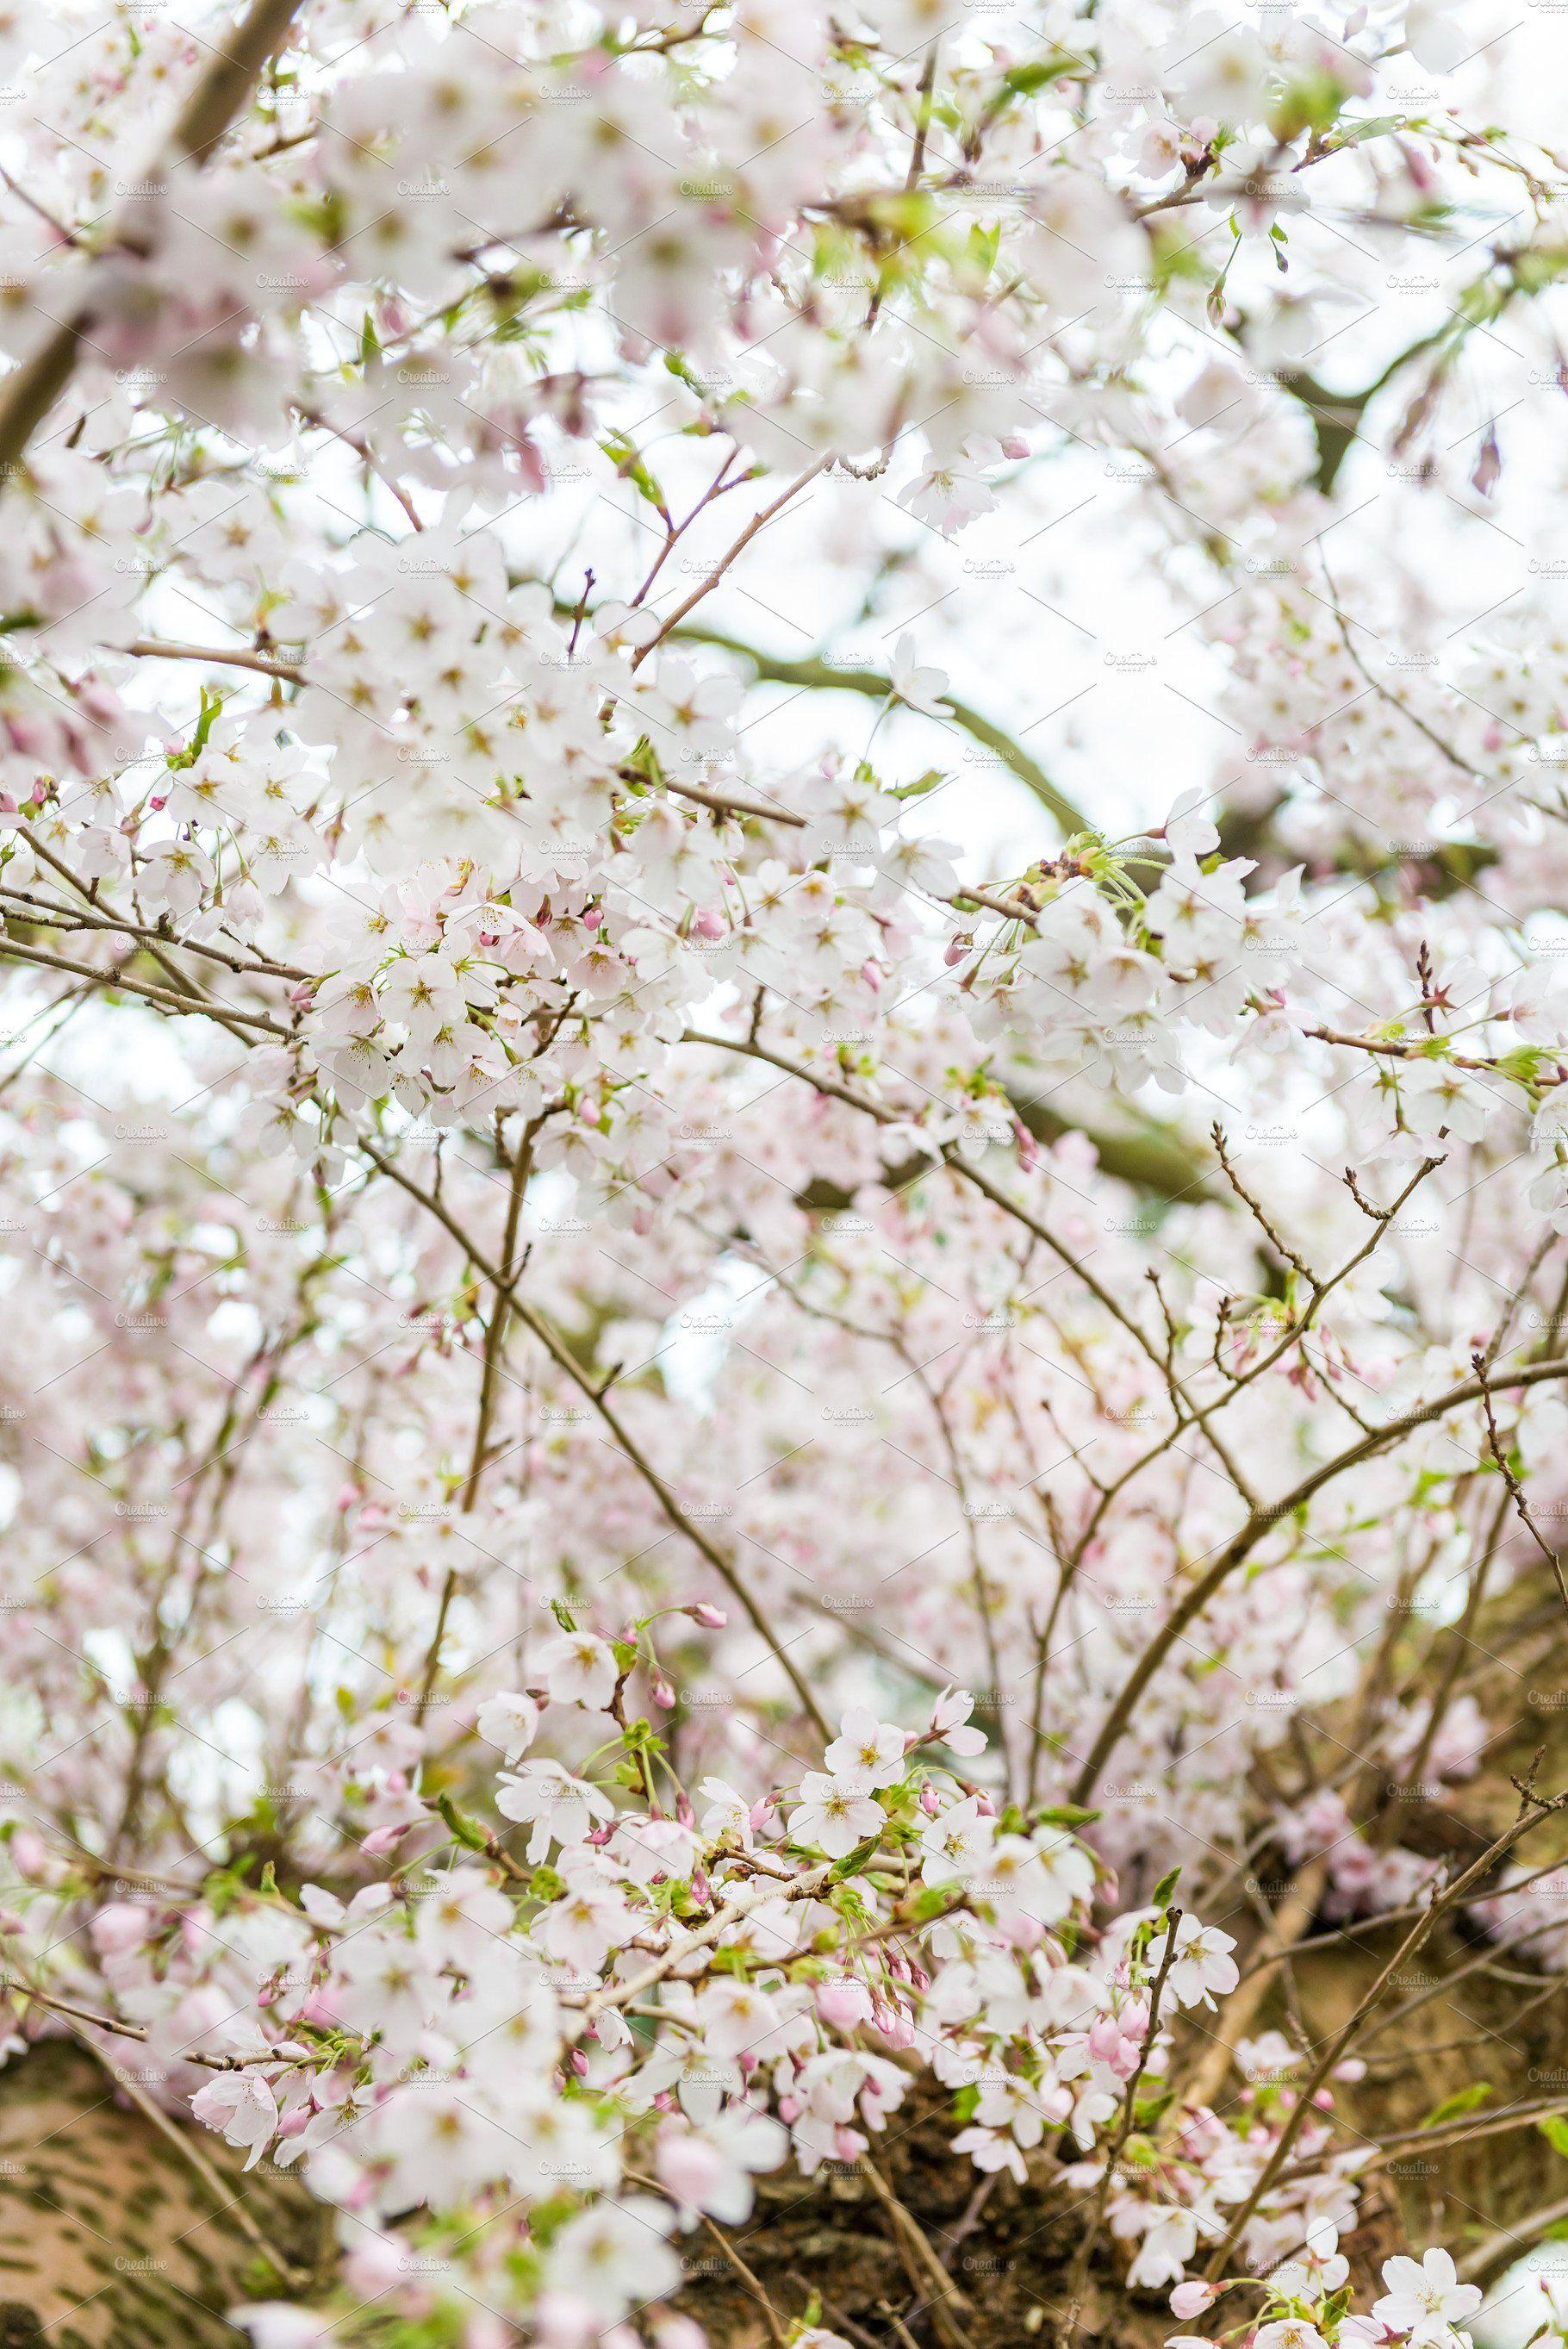 White Flowers Cherry Blossom Tree Branch 720x1280 Wallpaper White Flowering Trees Blossom Trees Cherry Blossom Tree